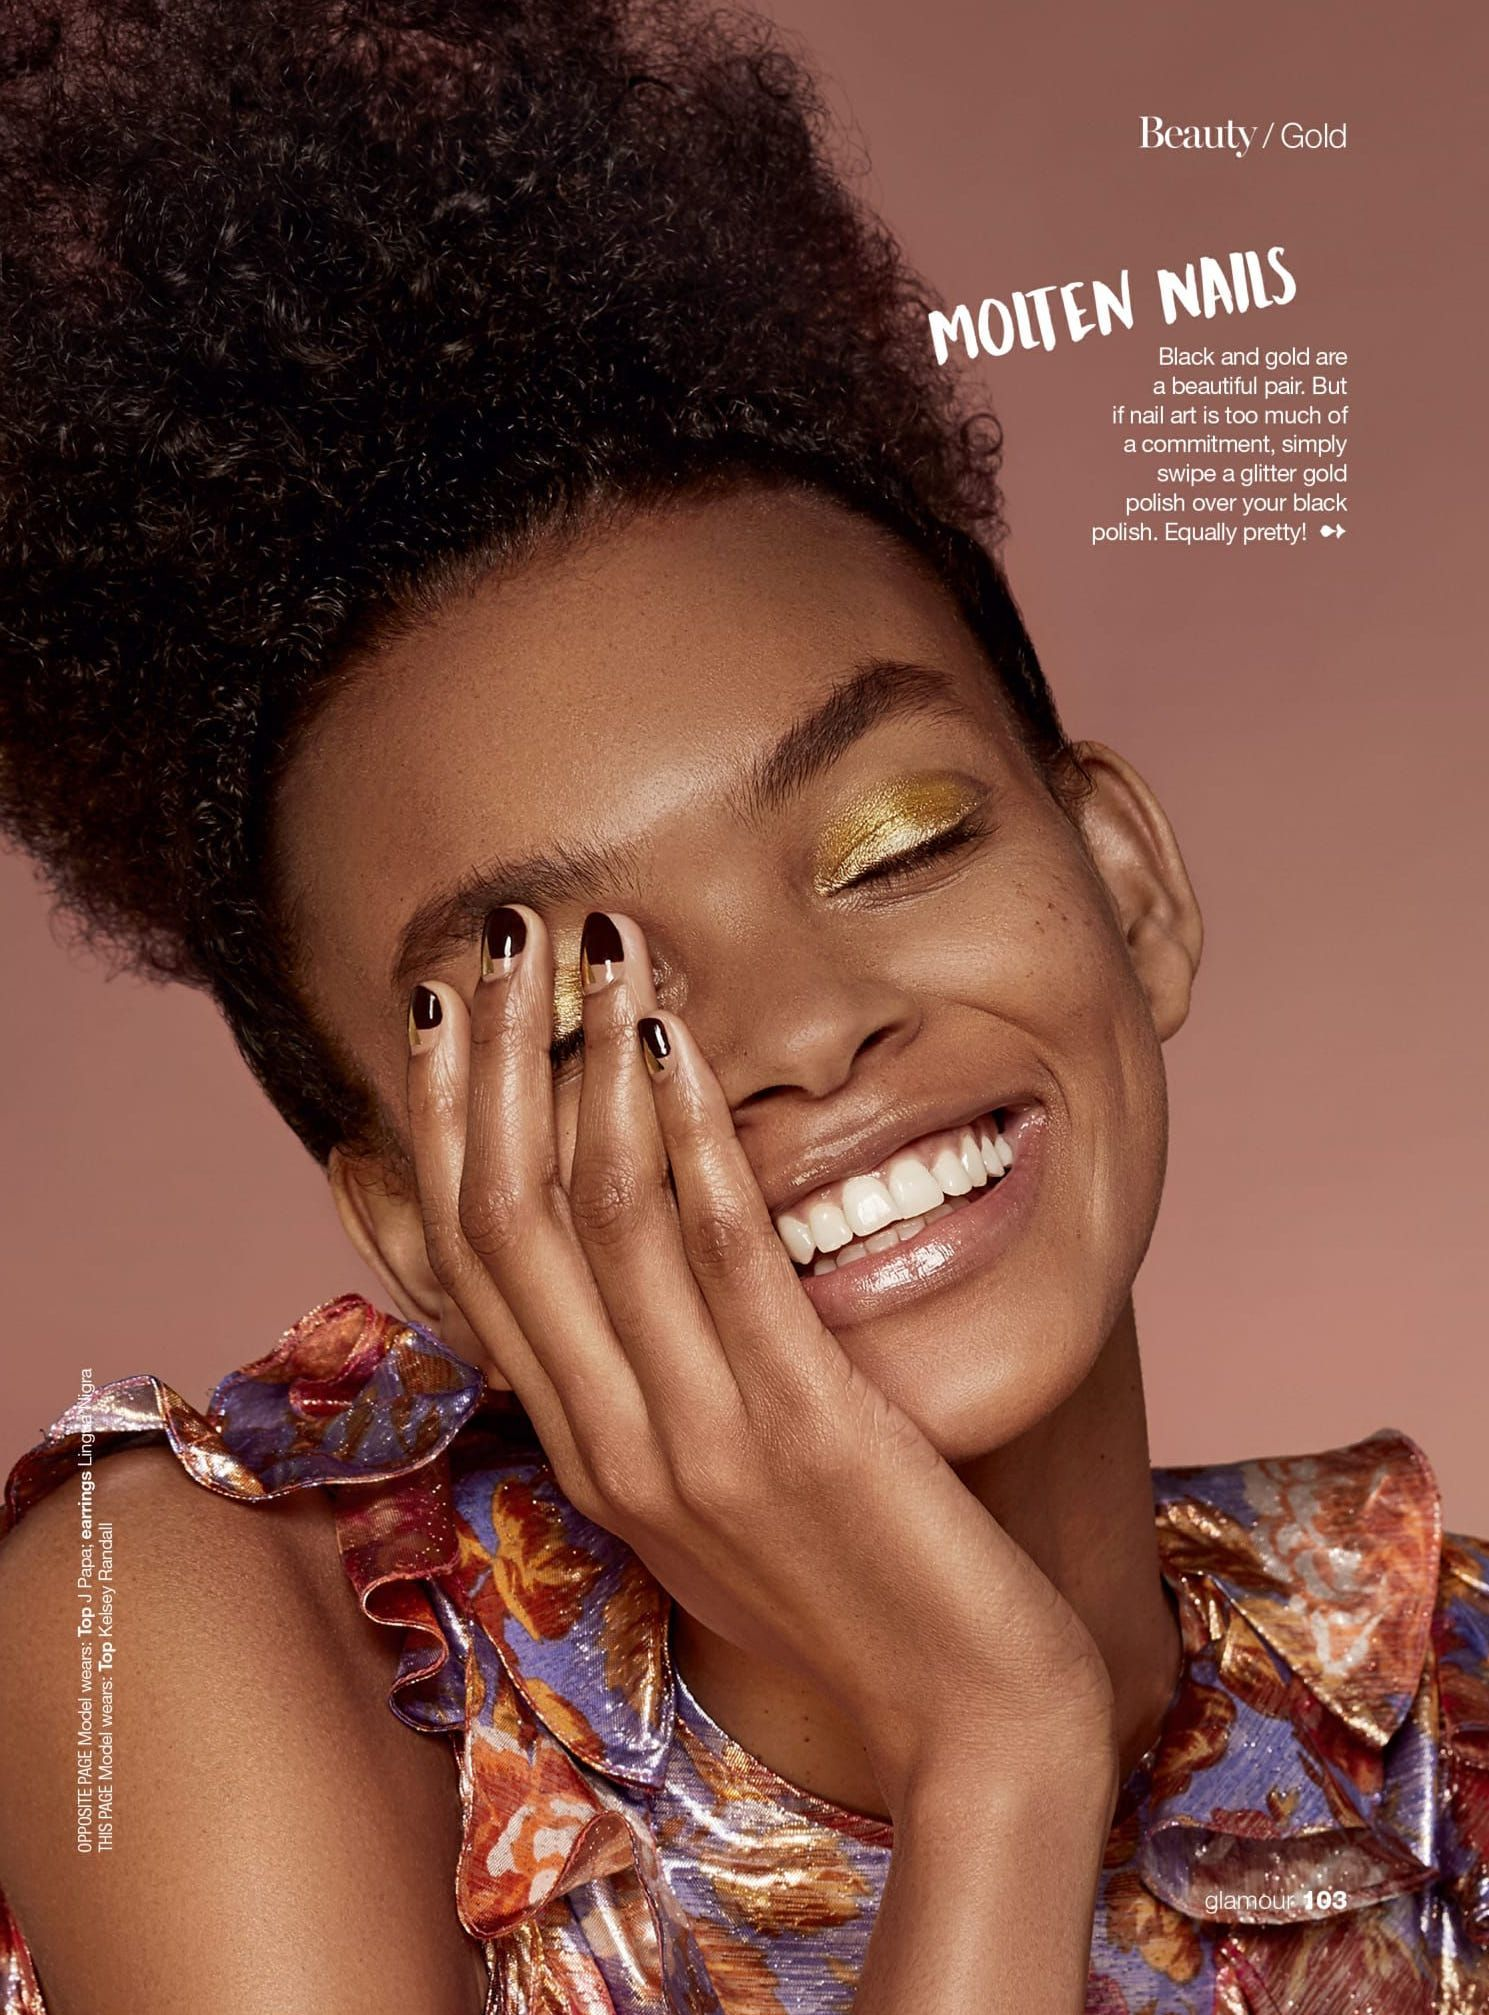 Janice Duque Condicional  Glamour South Africa beauty editorial story shot by photographer Itaysha  Jordan, makeup Liset Garza, ha… | Nyc beauty, Beauty products photography,  Black gold nails